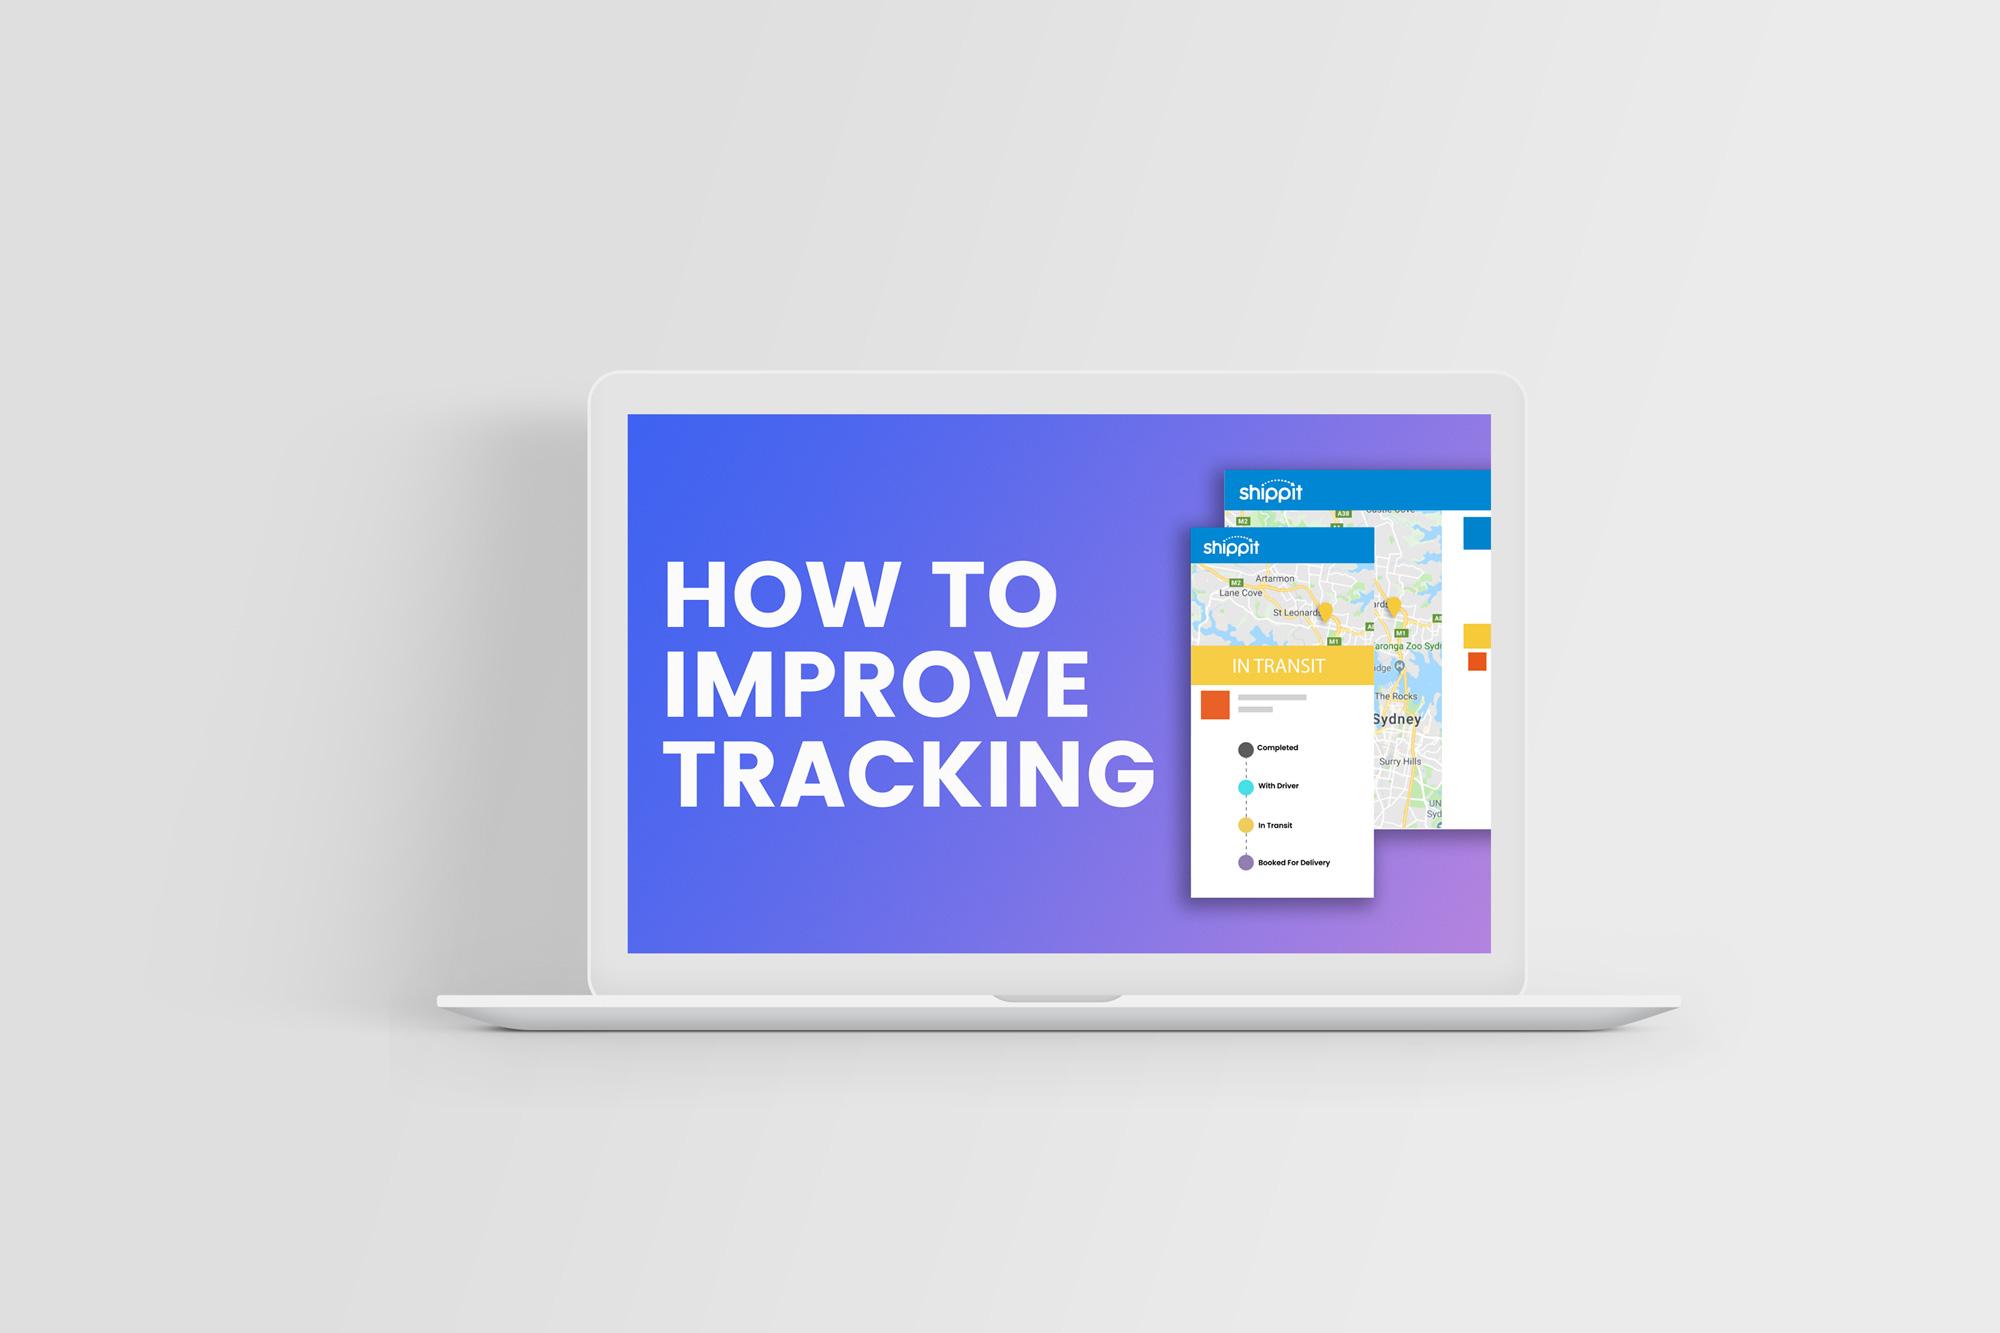 Better Tracking | Shippit